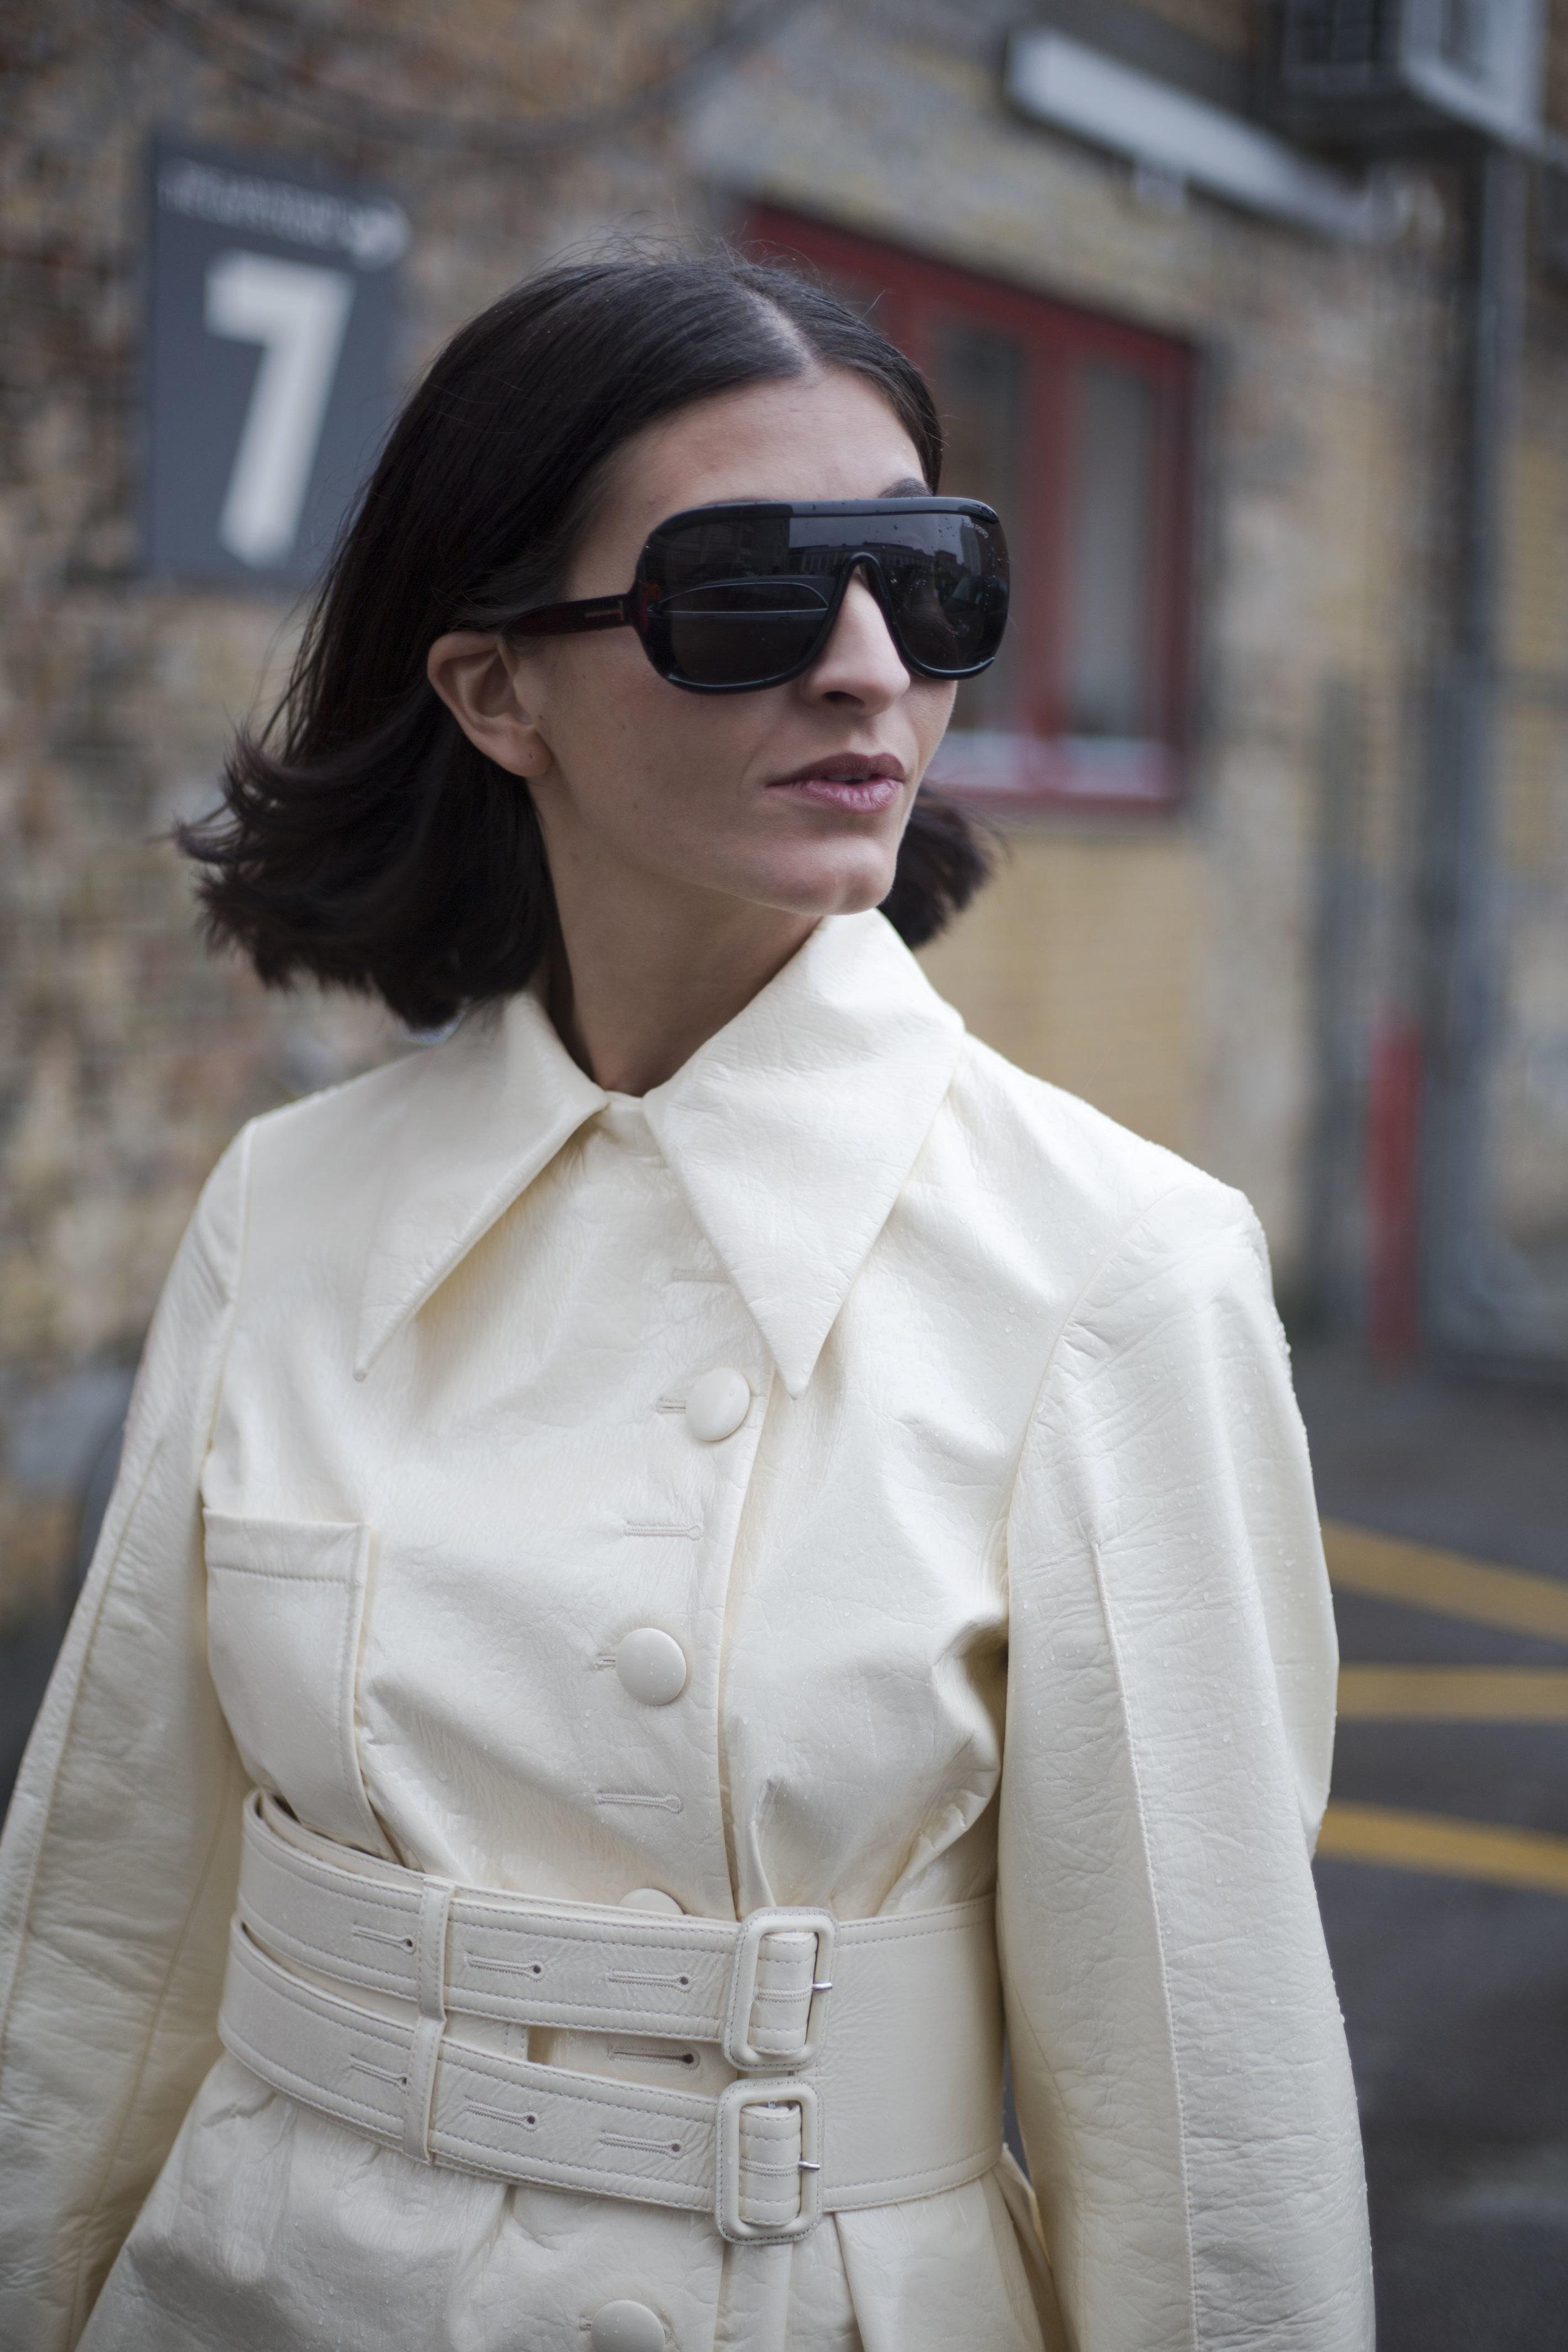 katarina-petrovic-copenhagen-fashionweek-scandinavian-street-style-streetstyle-thestreetland-fashion-best-style.jpg